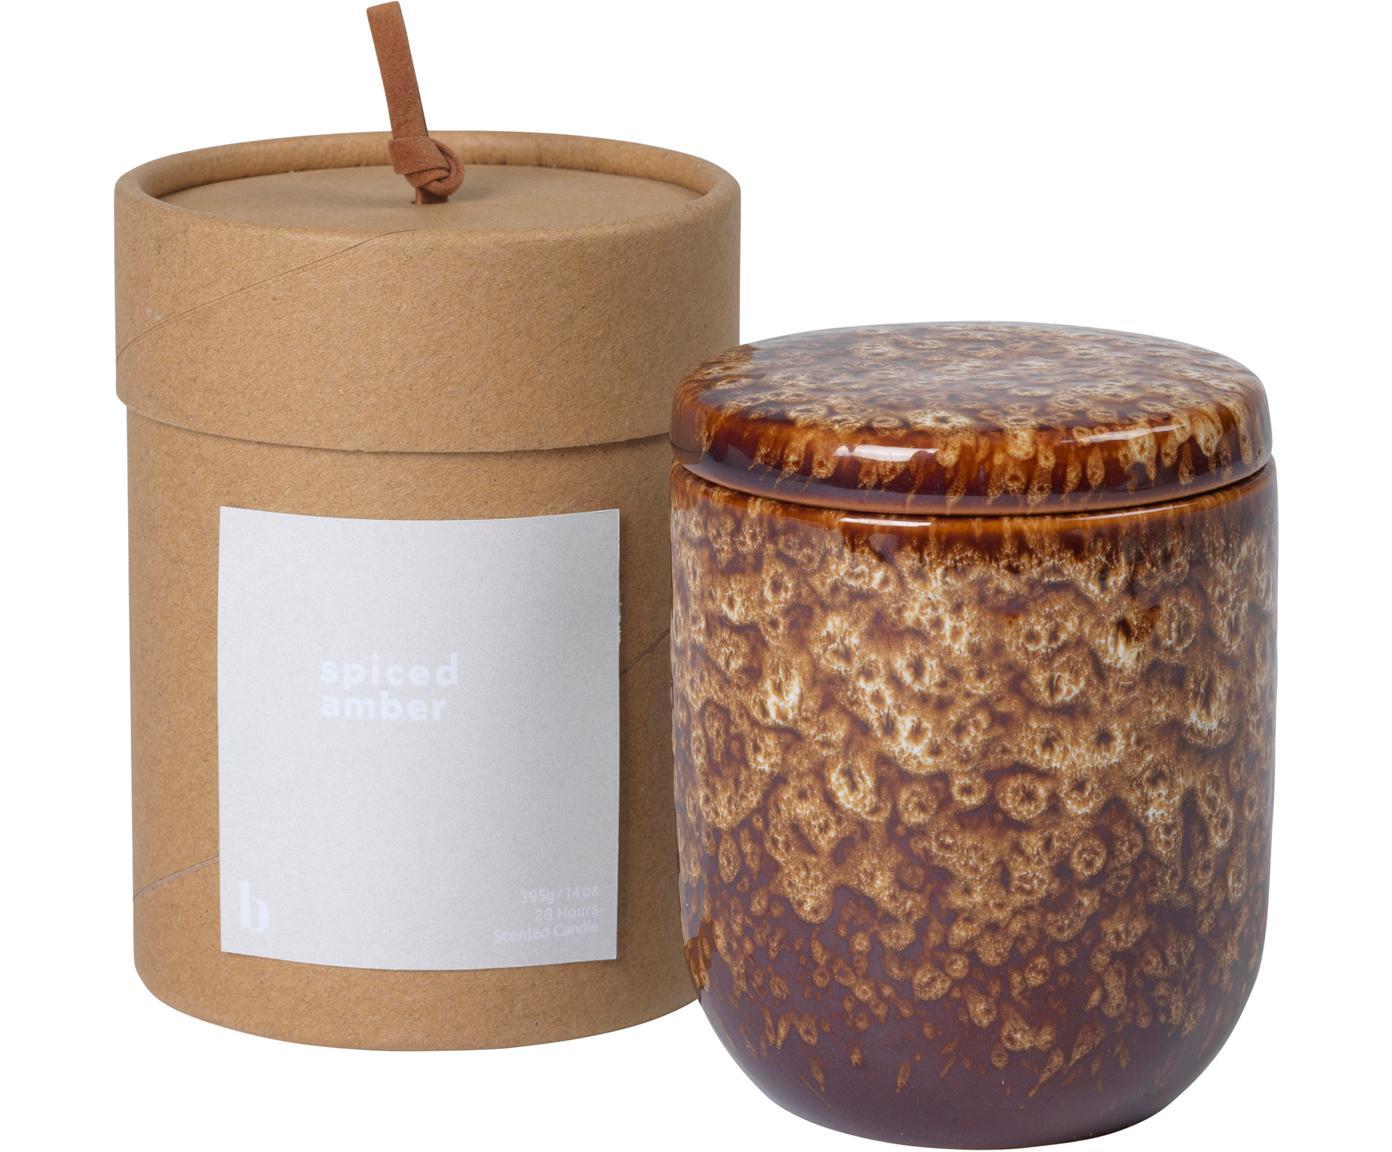 Vela perfumada Spiced Amber, Recipiente: cerámica, Marrón, Ø 8 x Al 9 cm